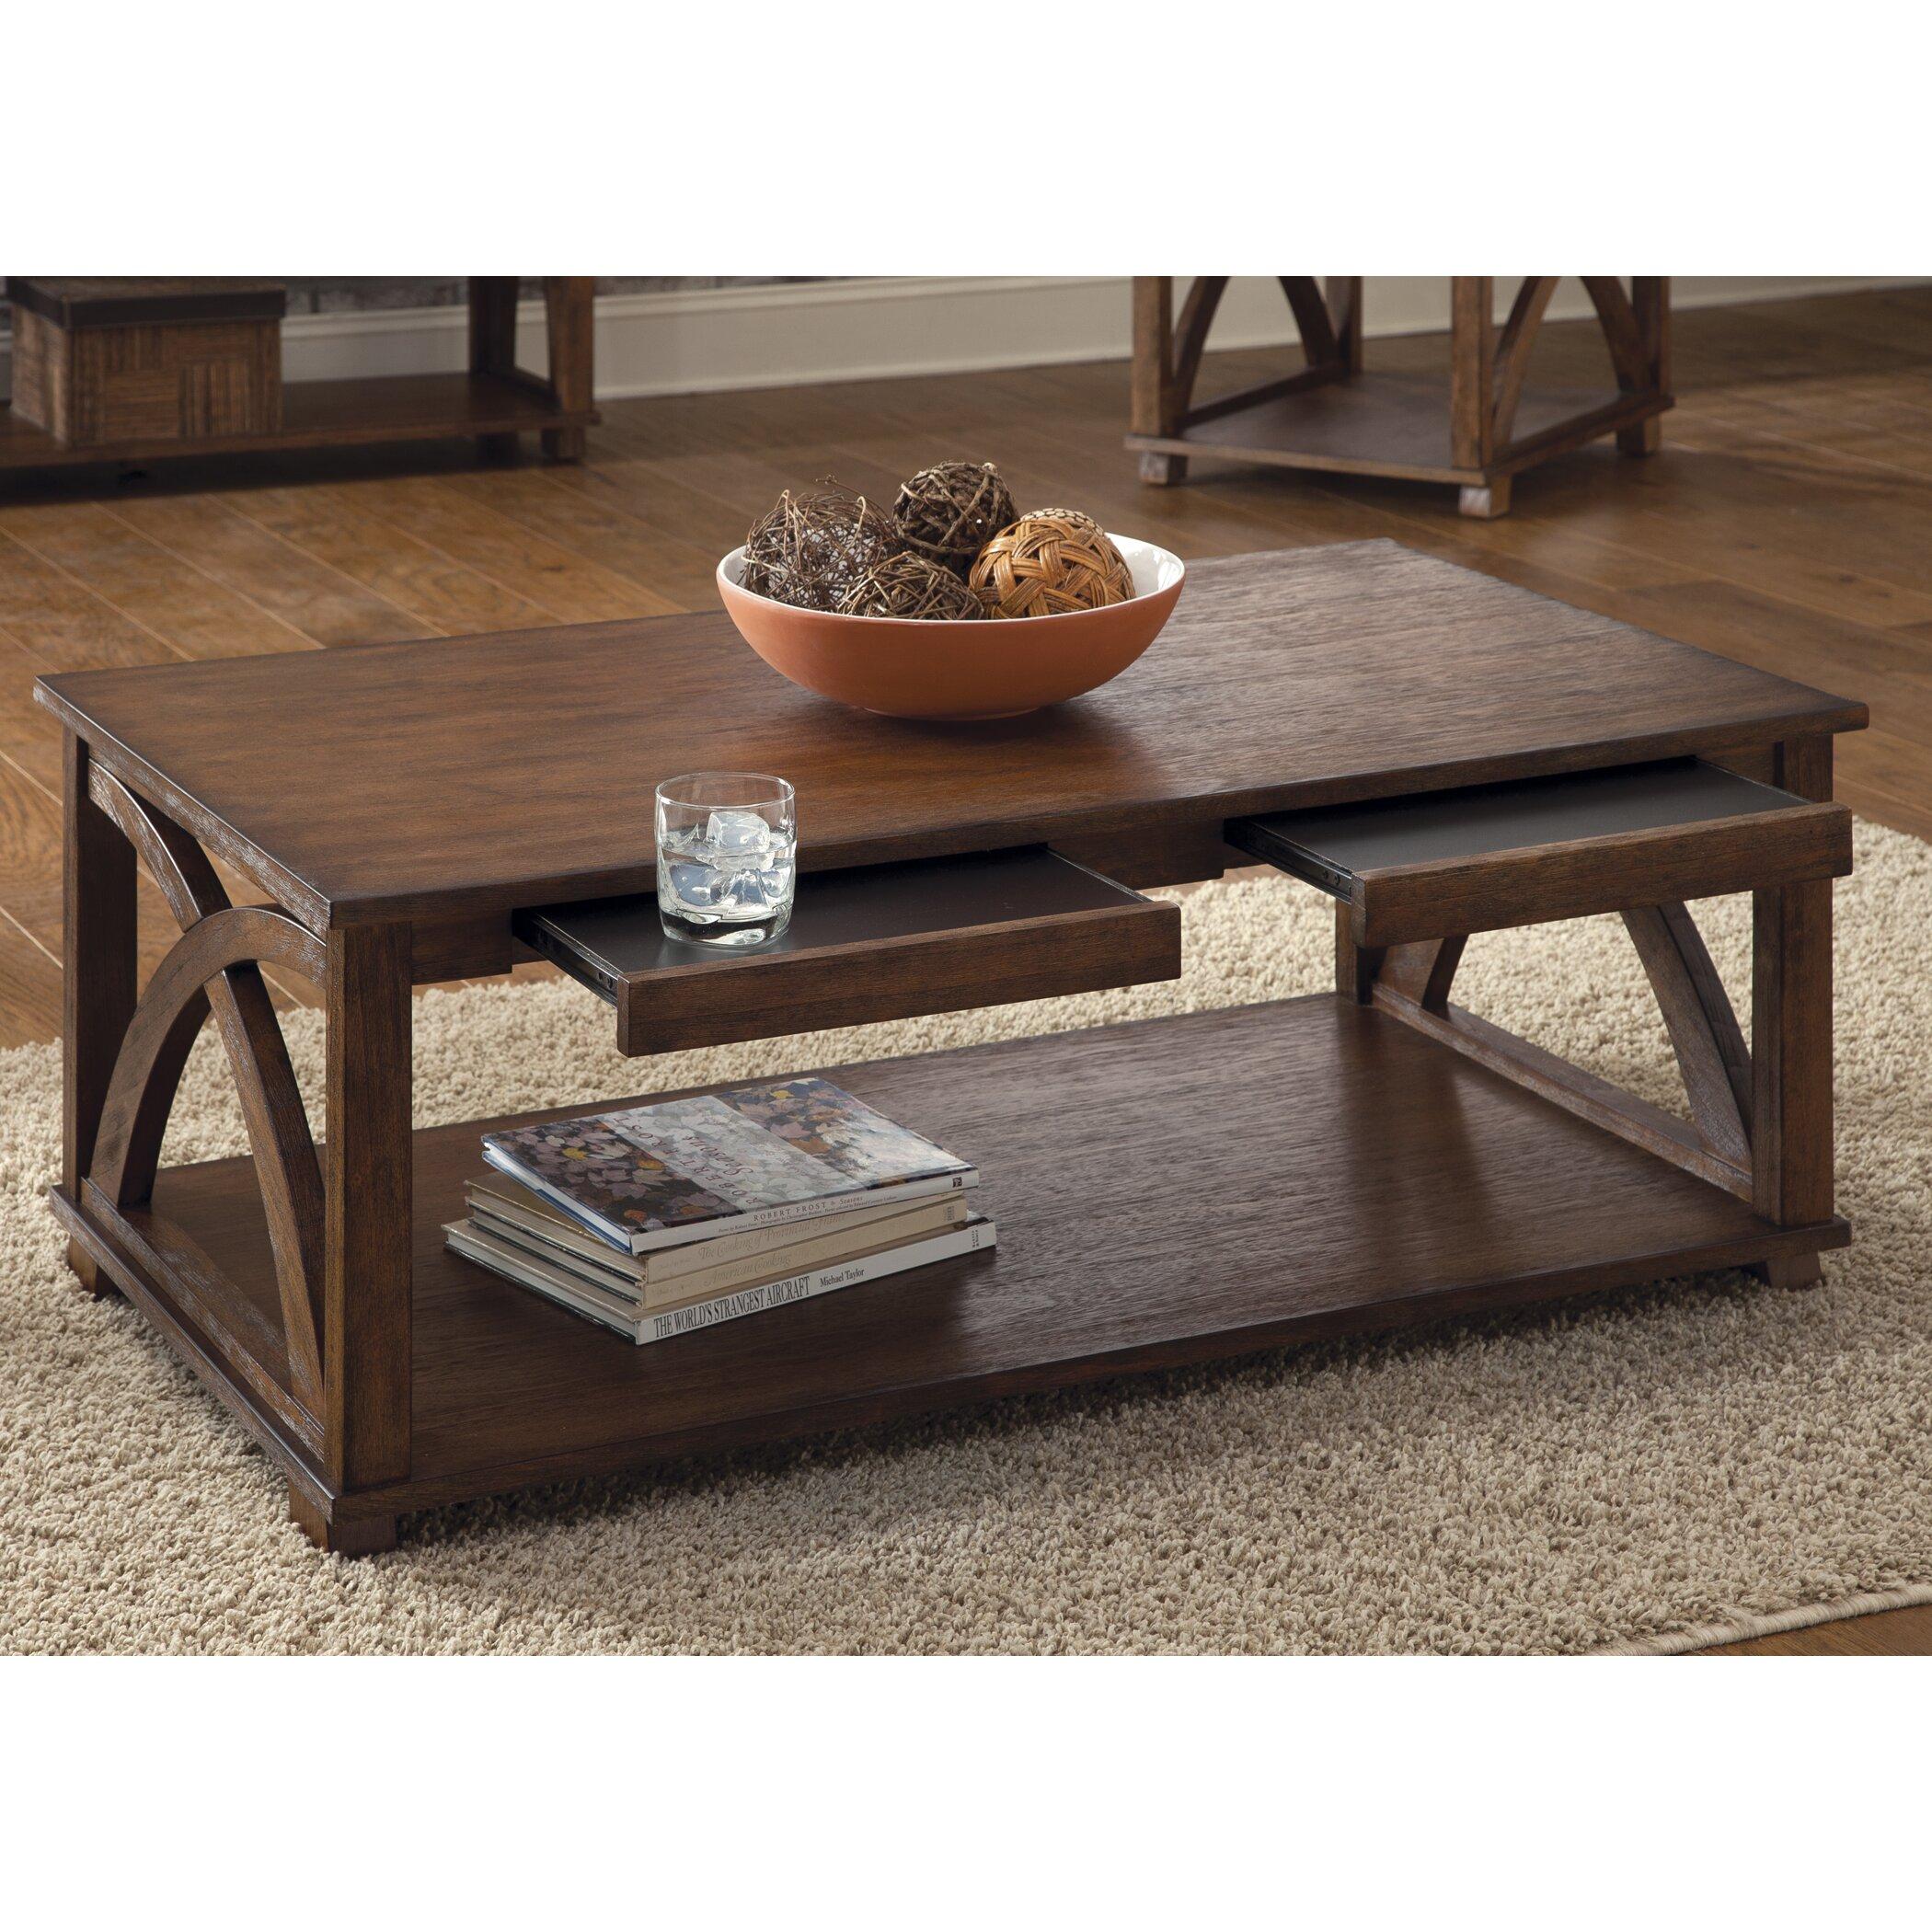 Hebbville Coffee Table Reviews: Wildon Home ® Chesapeake Occasional Coffee Table & Reviews